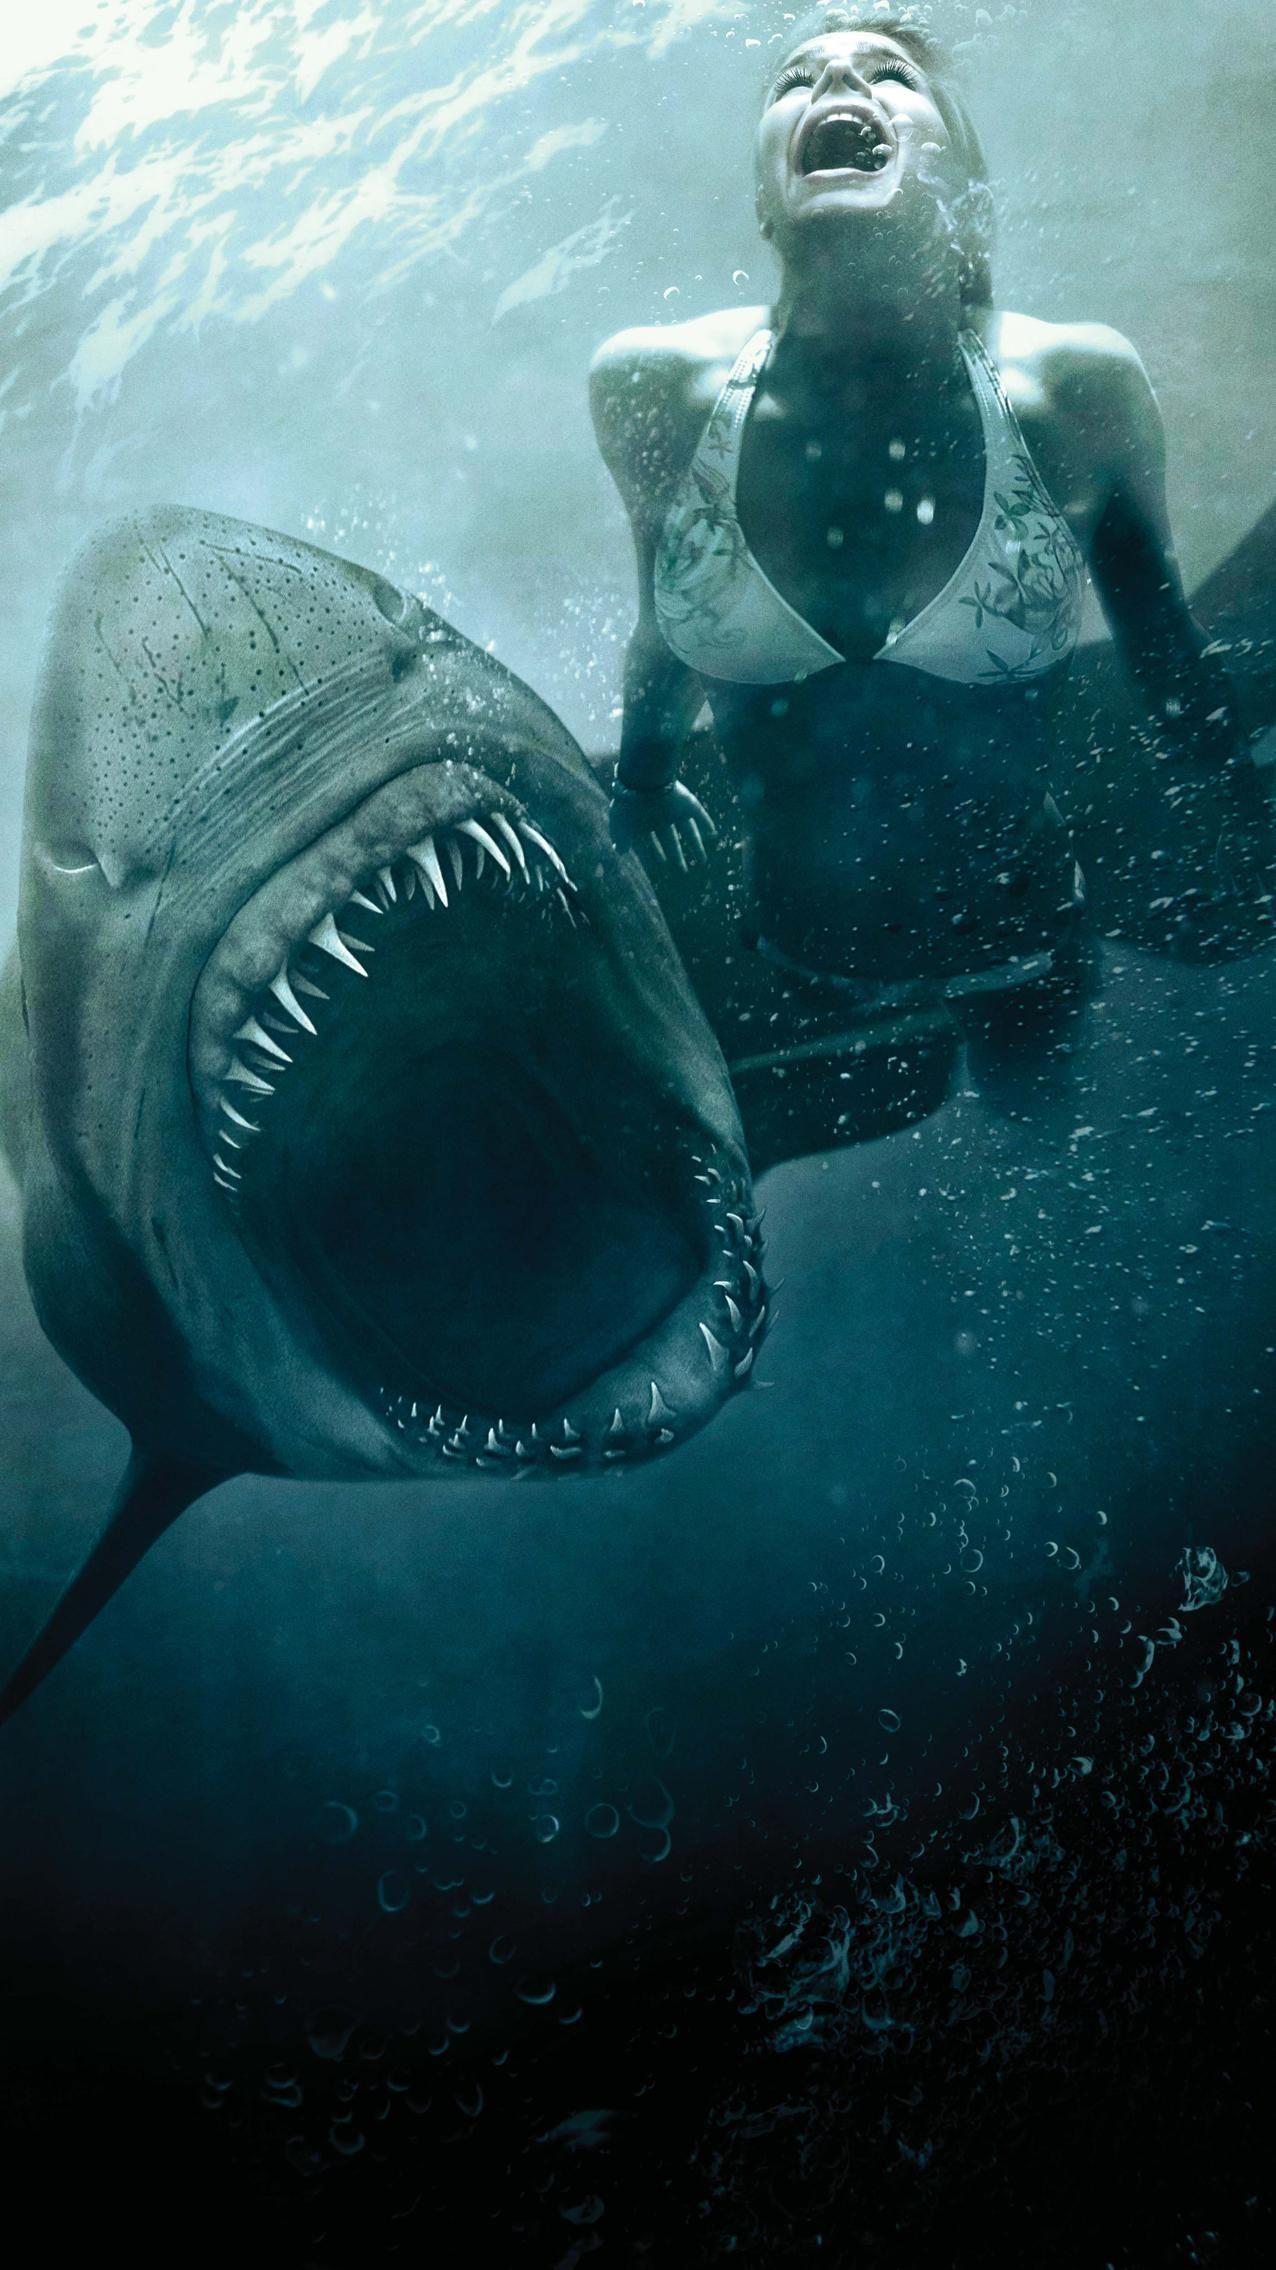 Shark Night 3d 2011 Phone Wallpaper In 2020 Sharks Scary Shark Pictures Shark